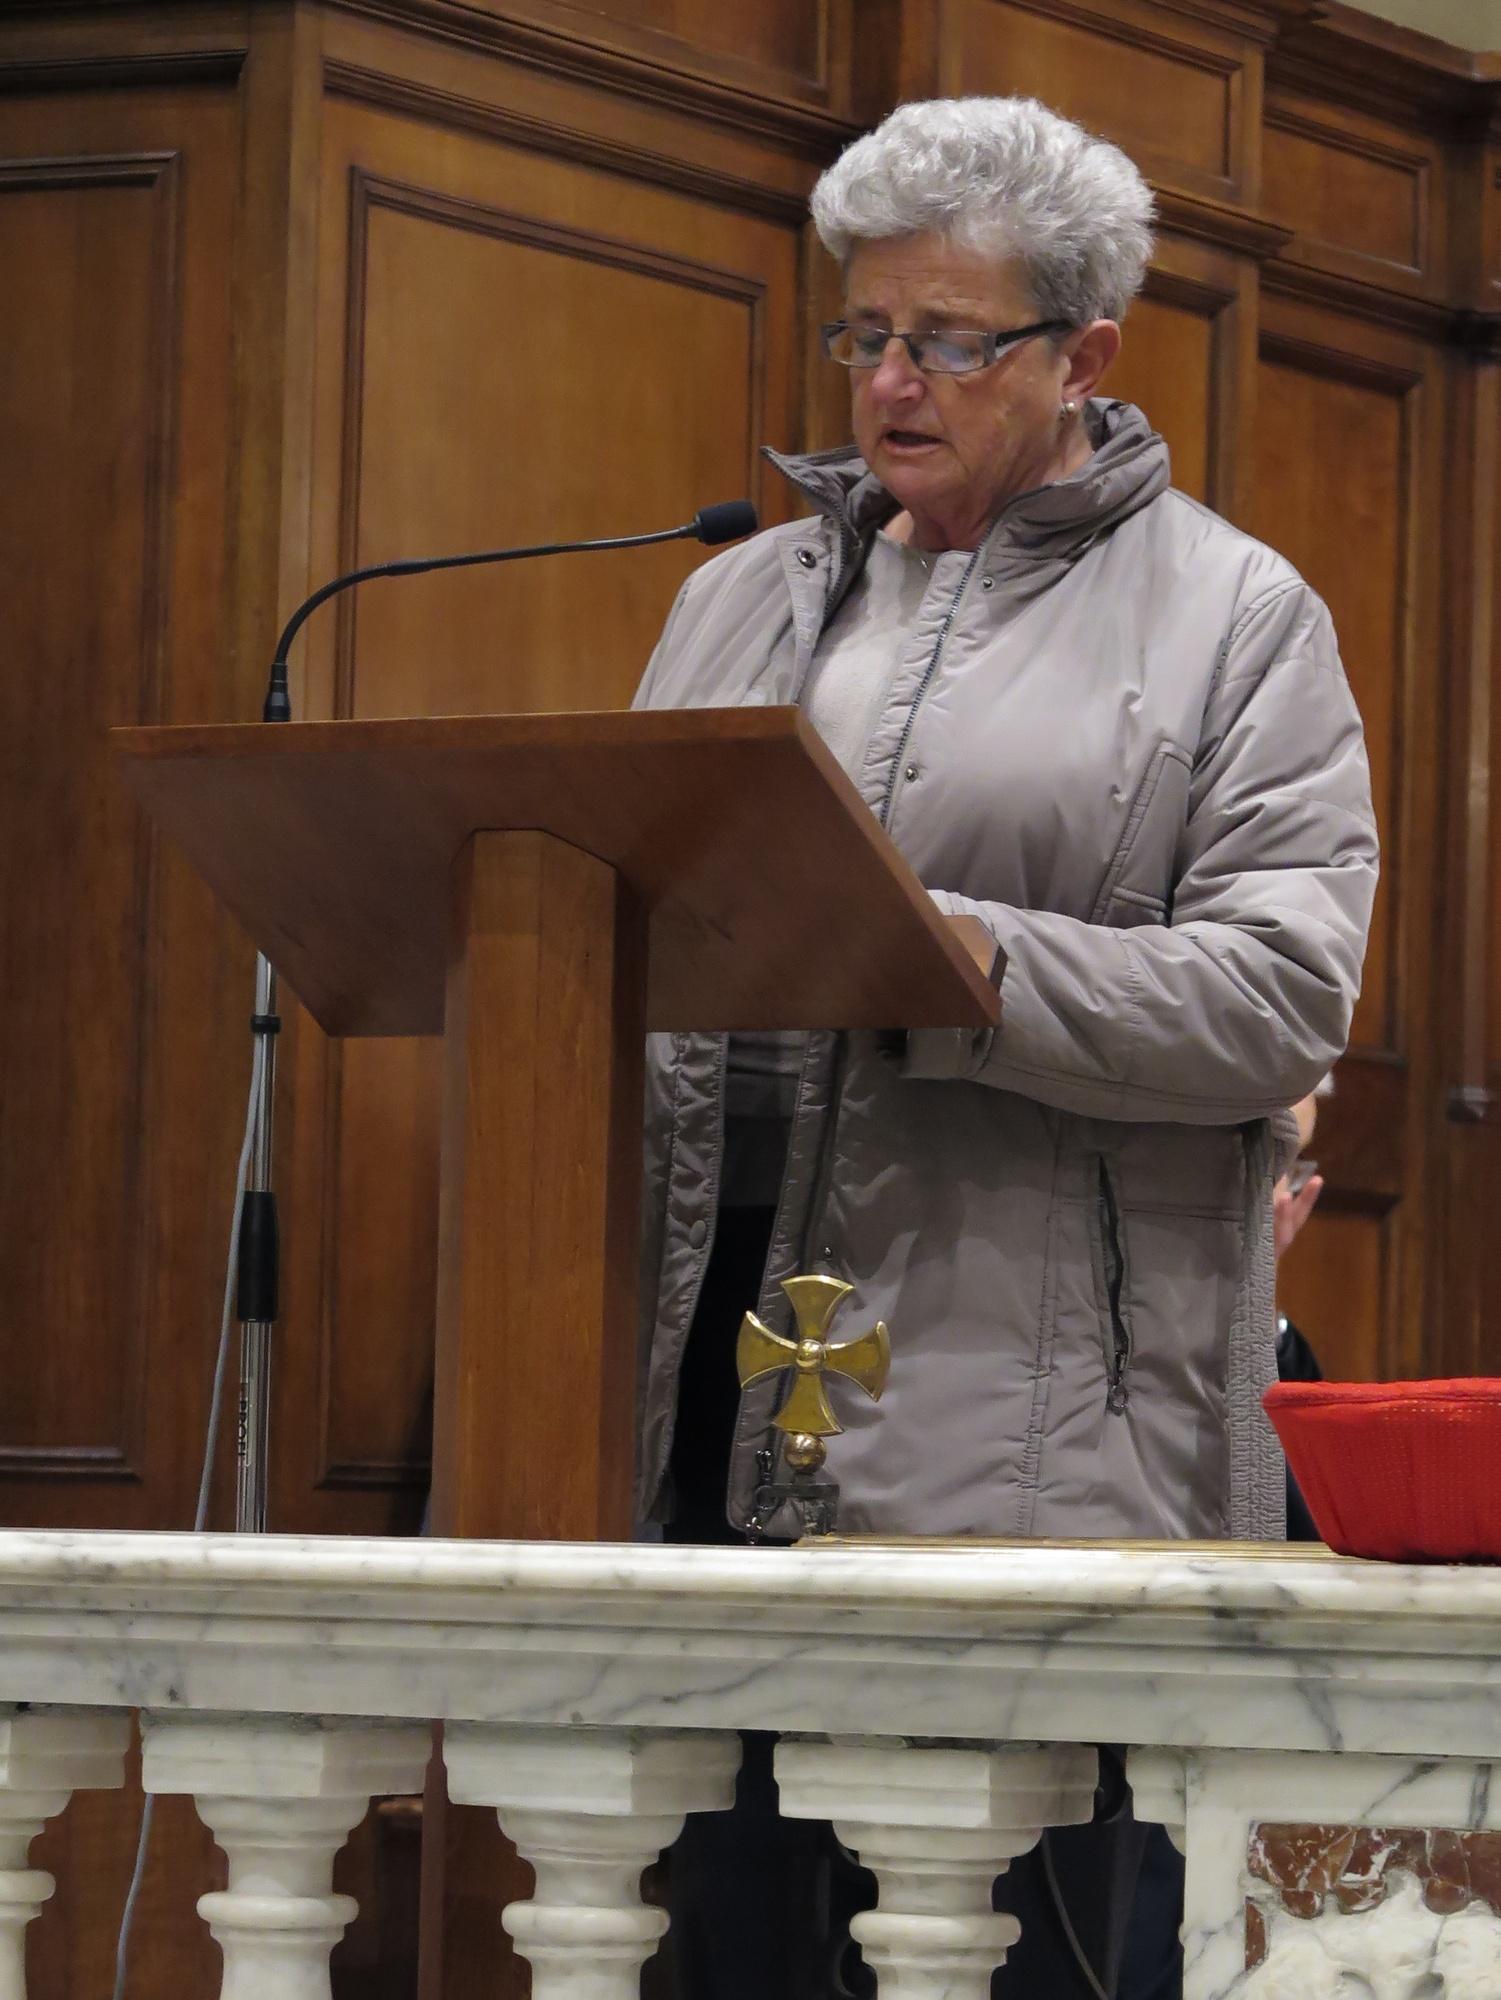 veglia-martiri-missionari-sturla-2016-04-02-21-11-45